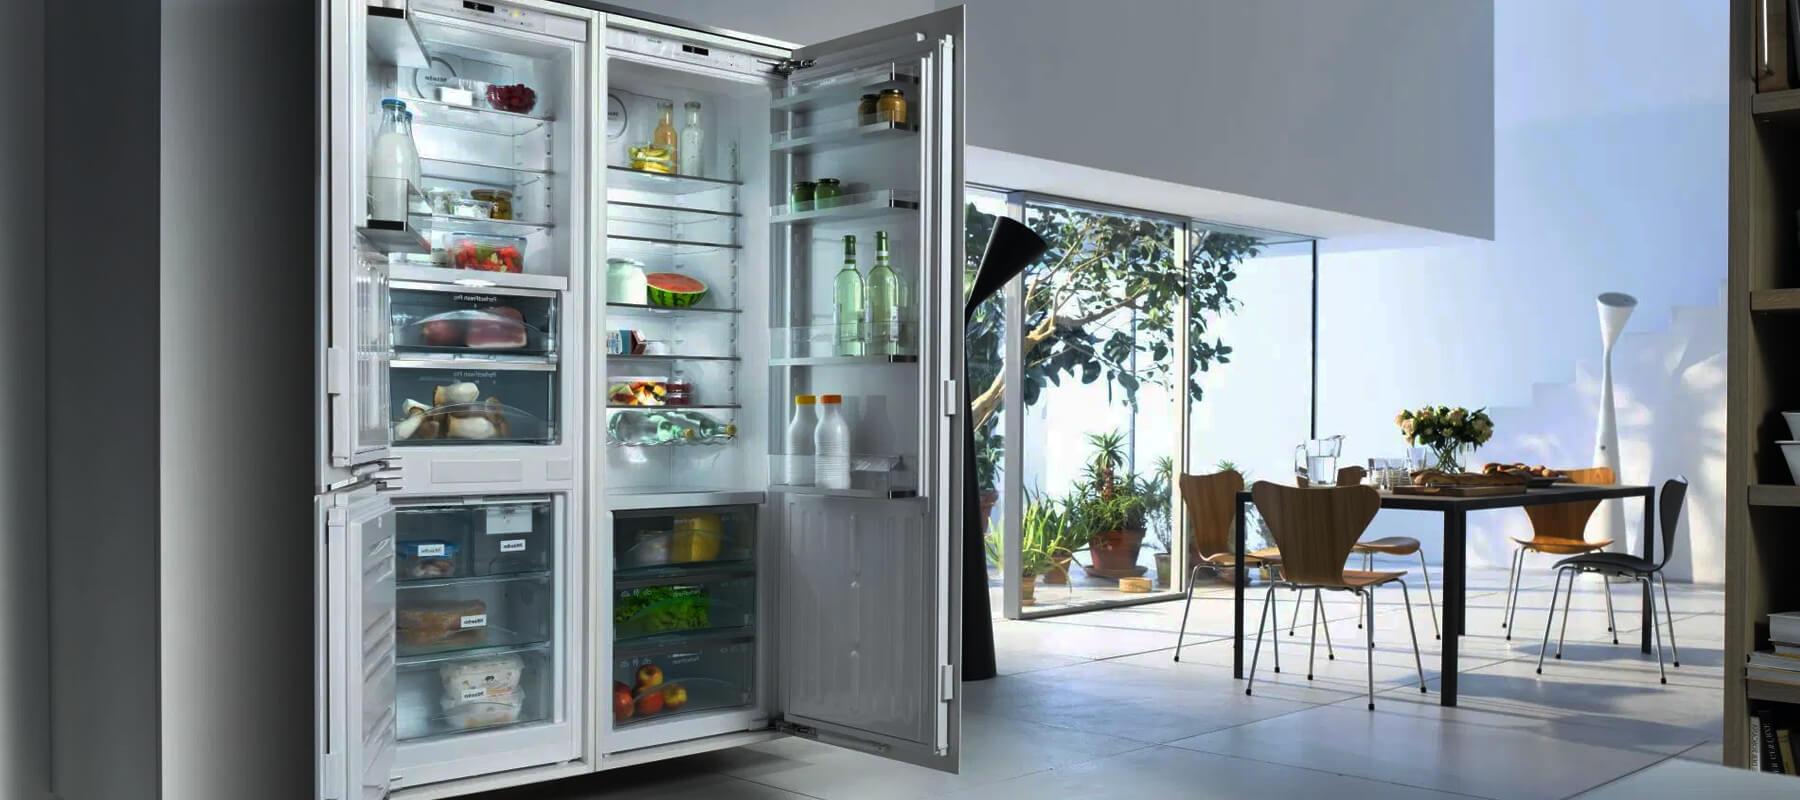 Miele Authorized Repair Service | Built in Refrigerator Repair Service